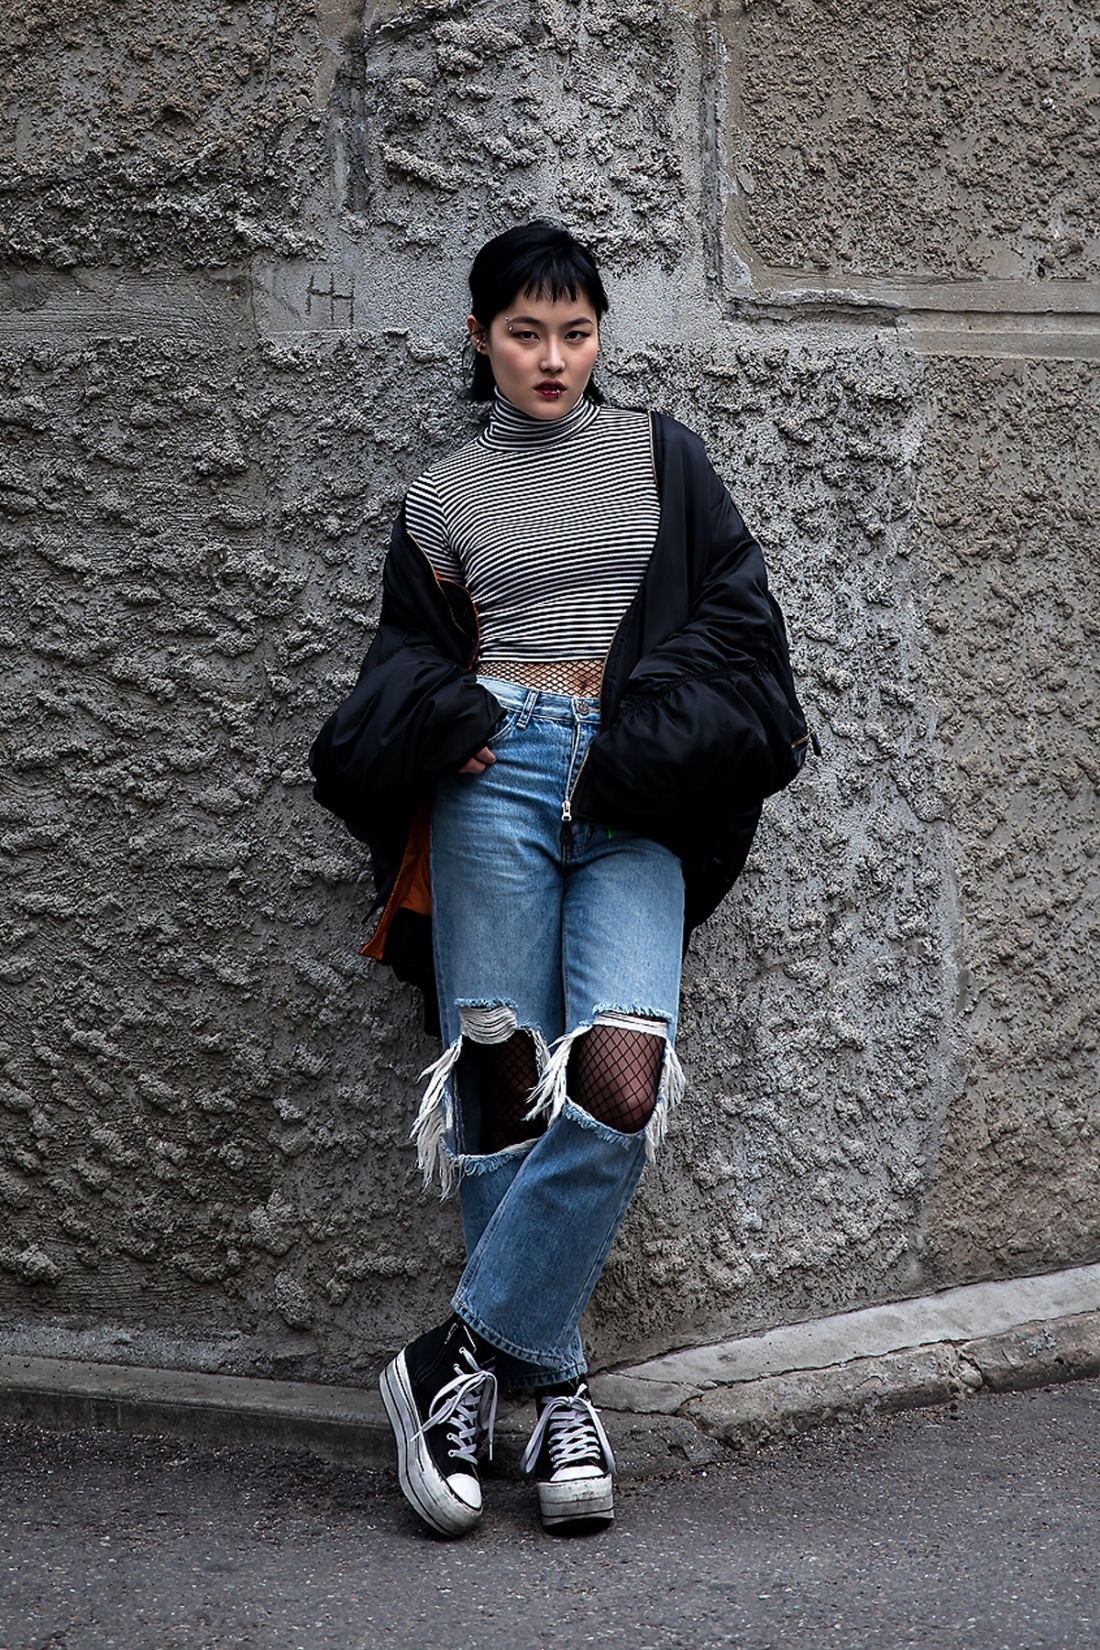 Hwang Dohye, Street Fashion 2017 in SEOUL.jpg